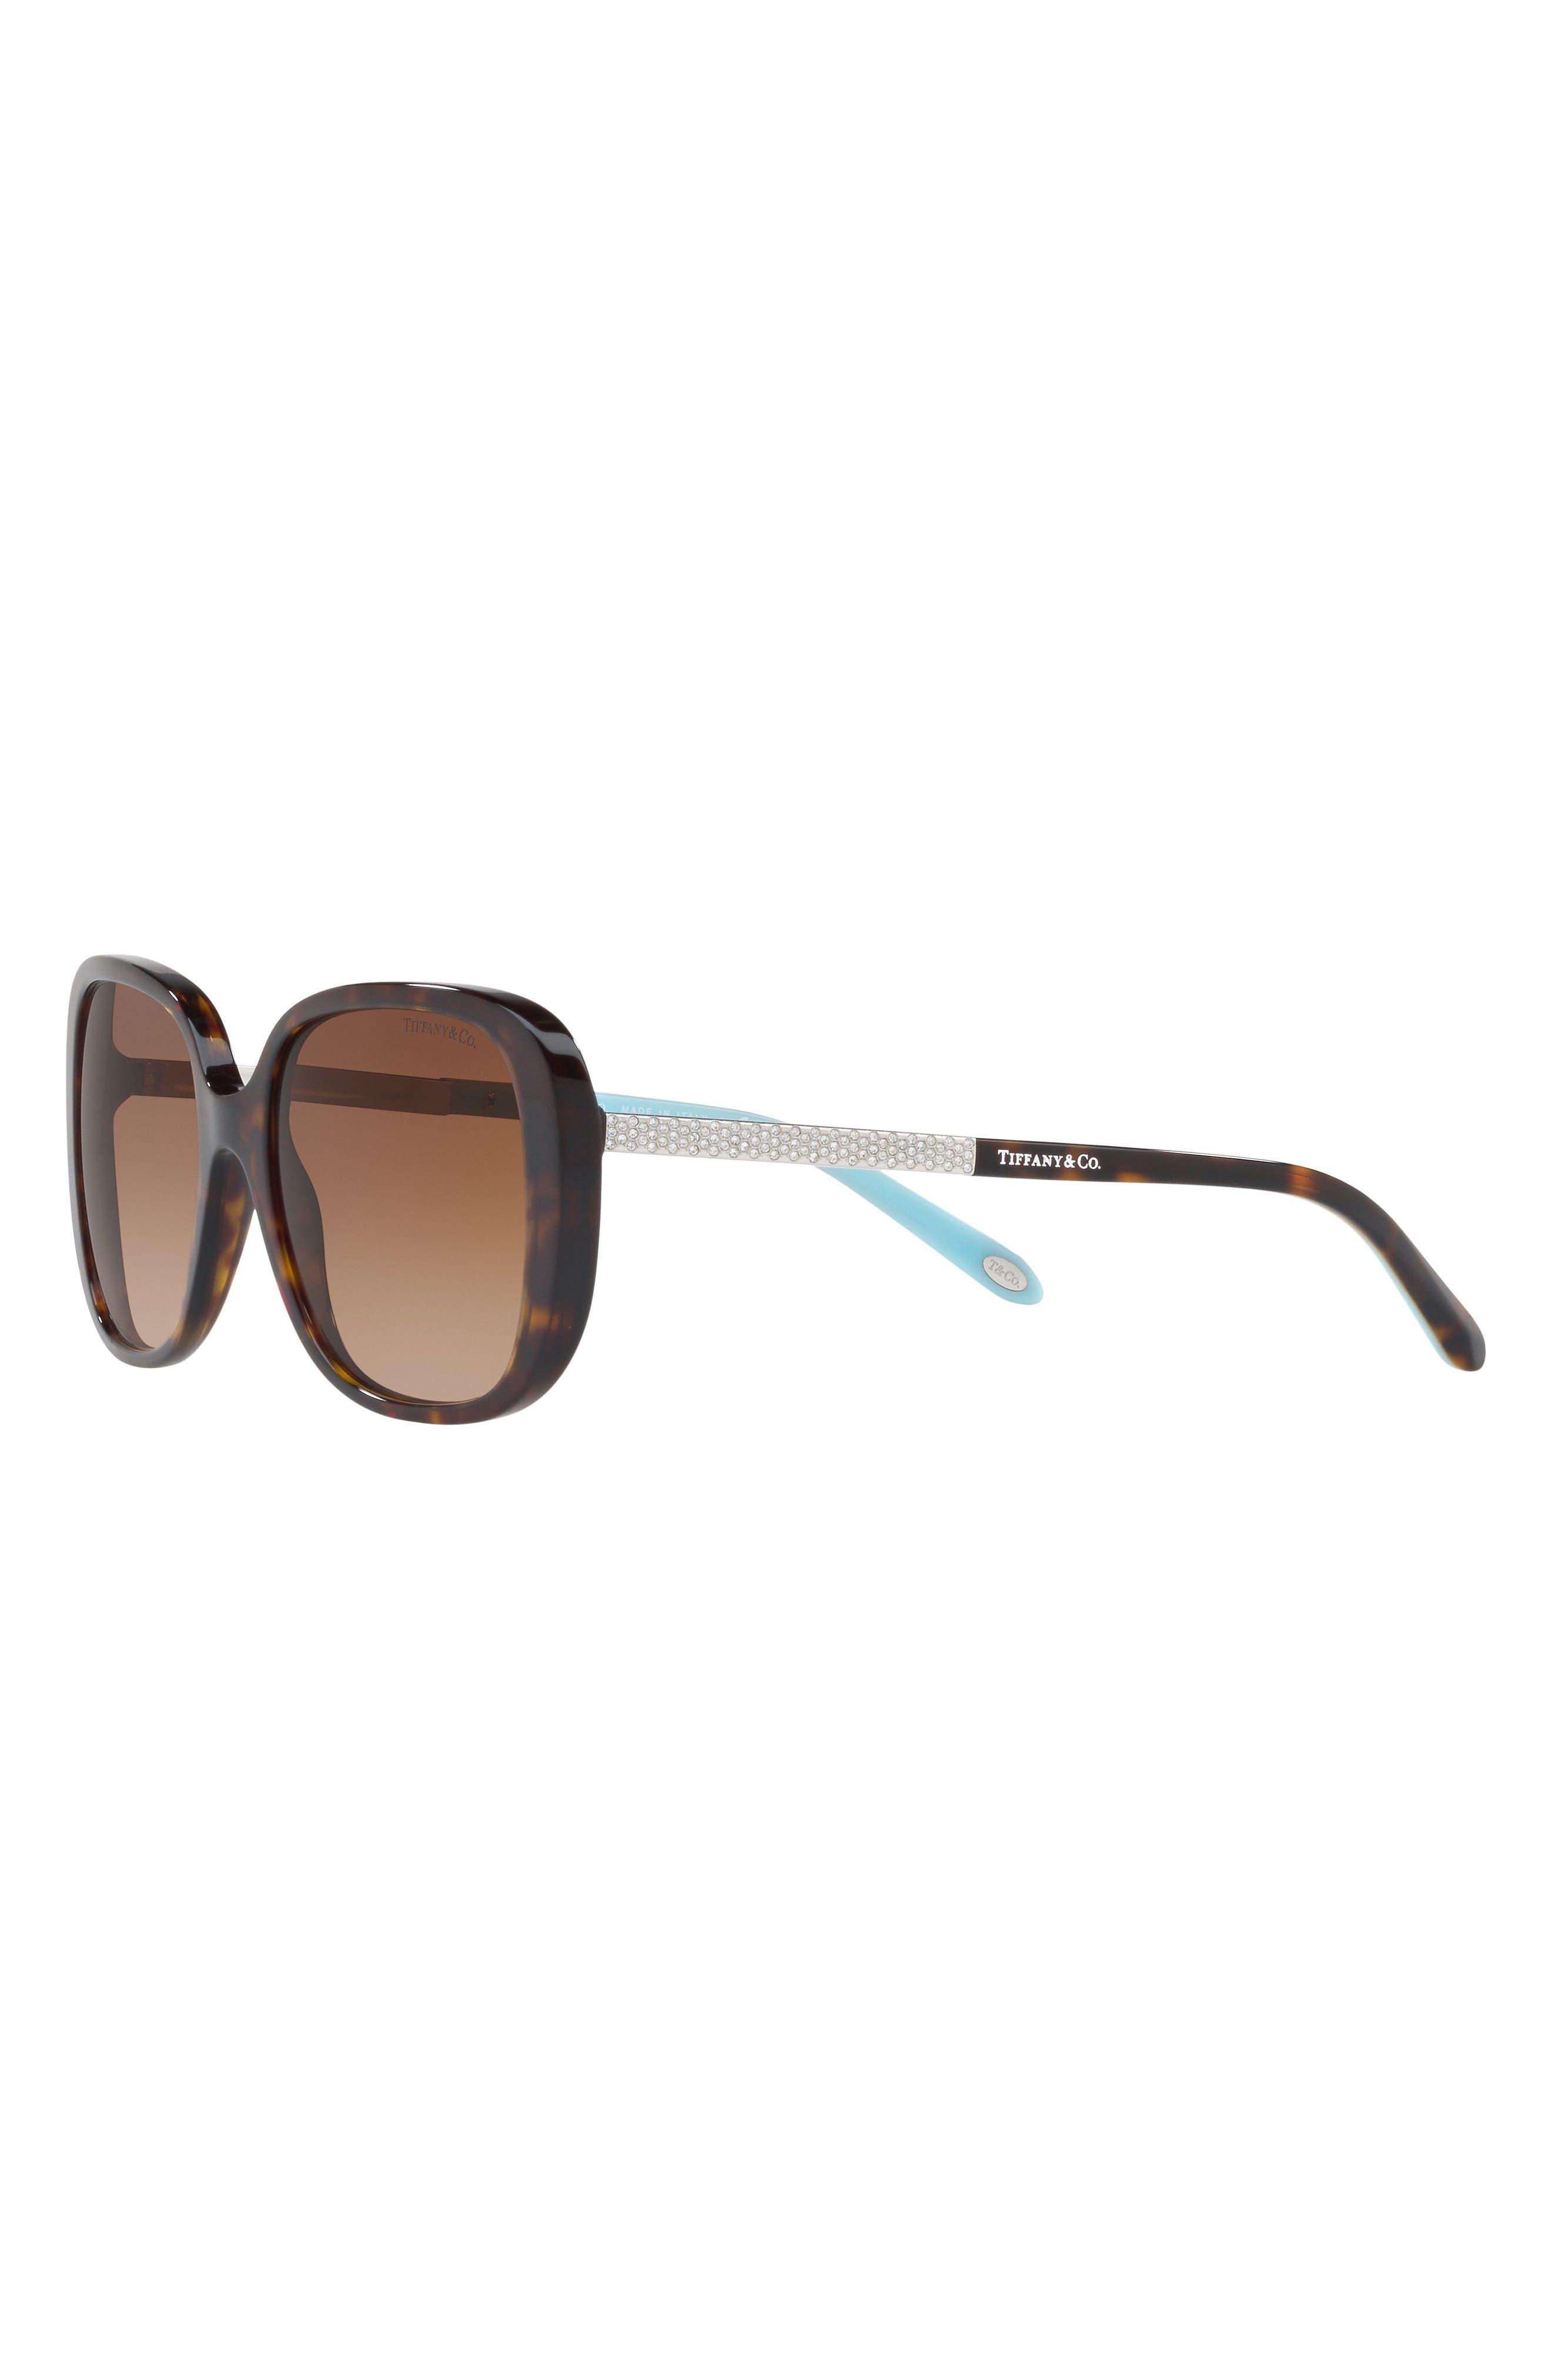 54mm Gradient Sunglasses,                             Alternate thumbnail 2, color,                             Dark Havana